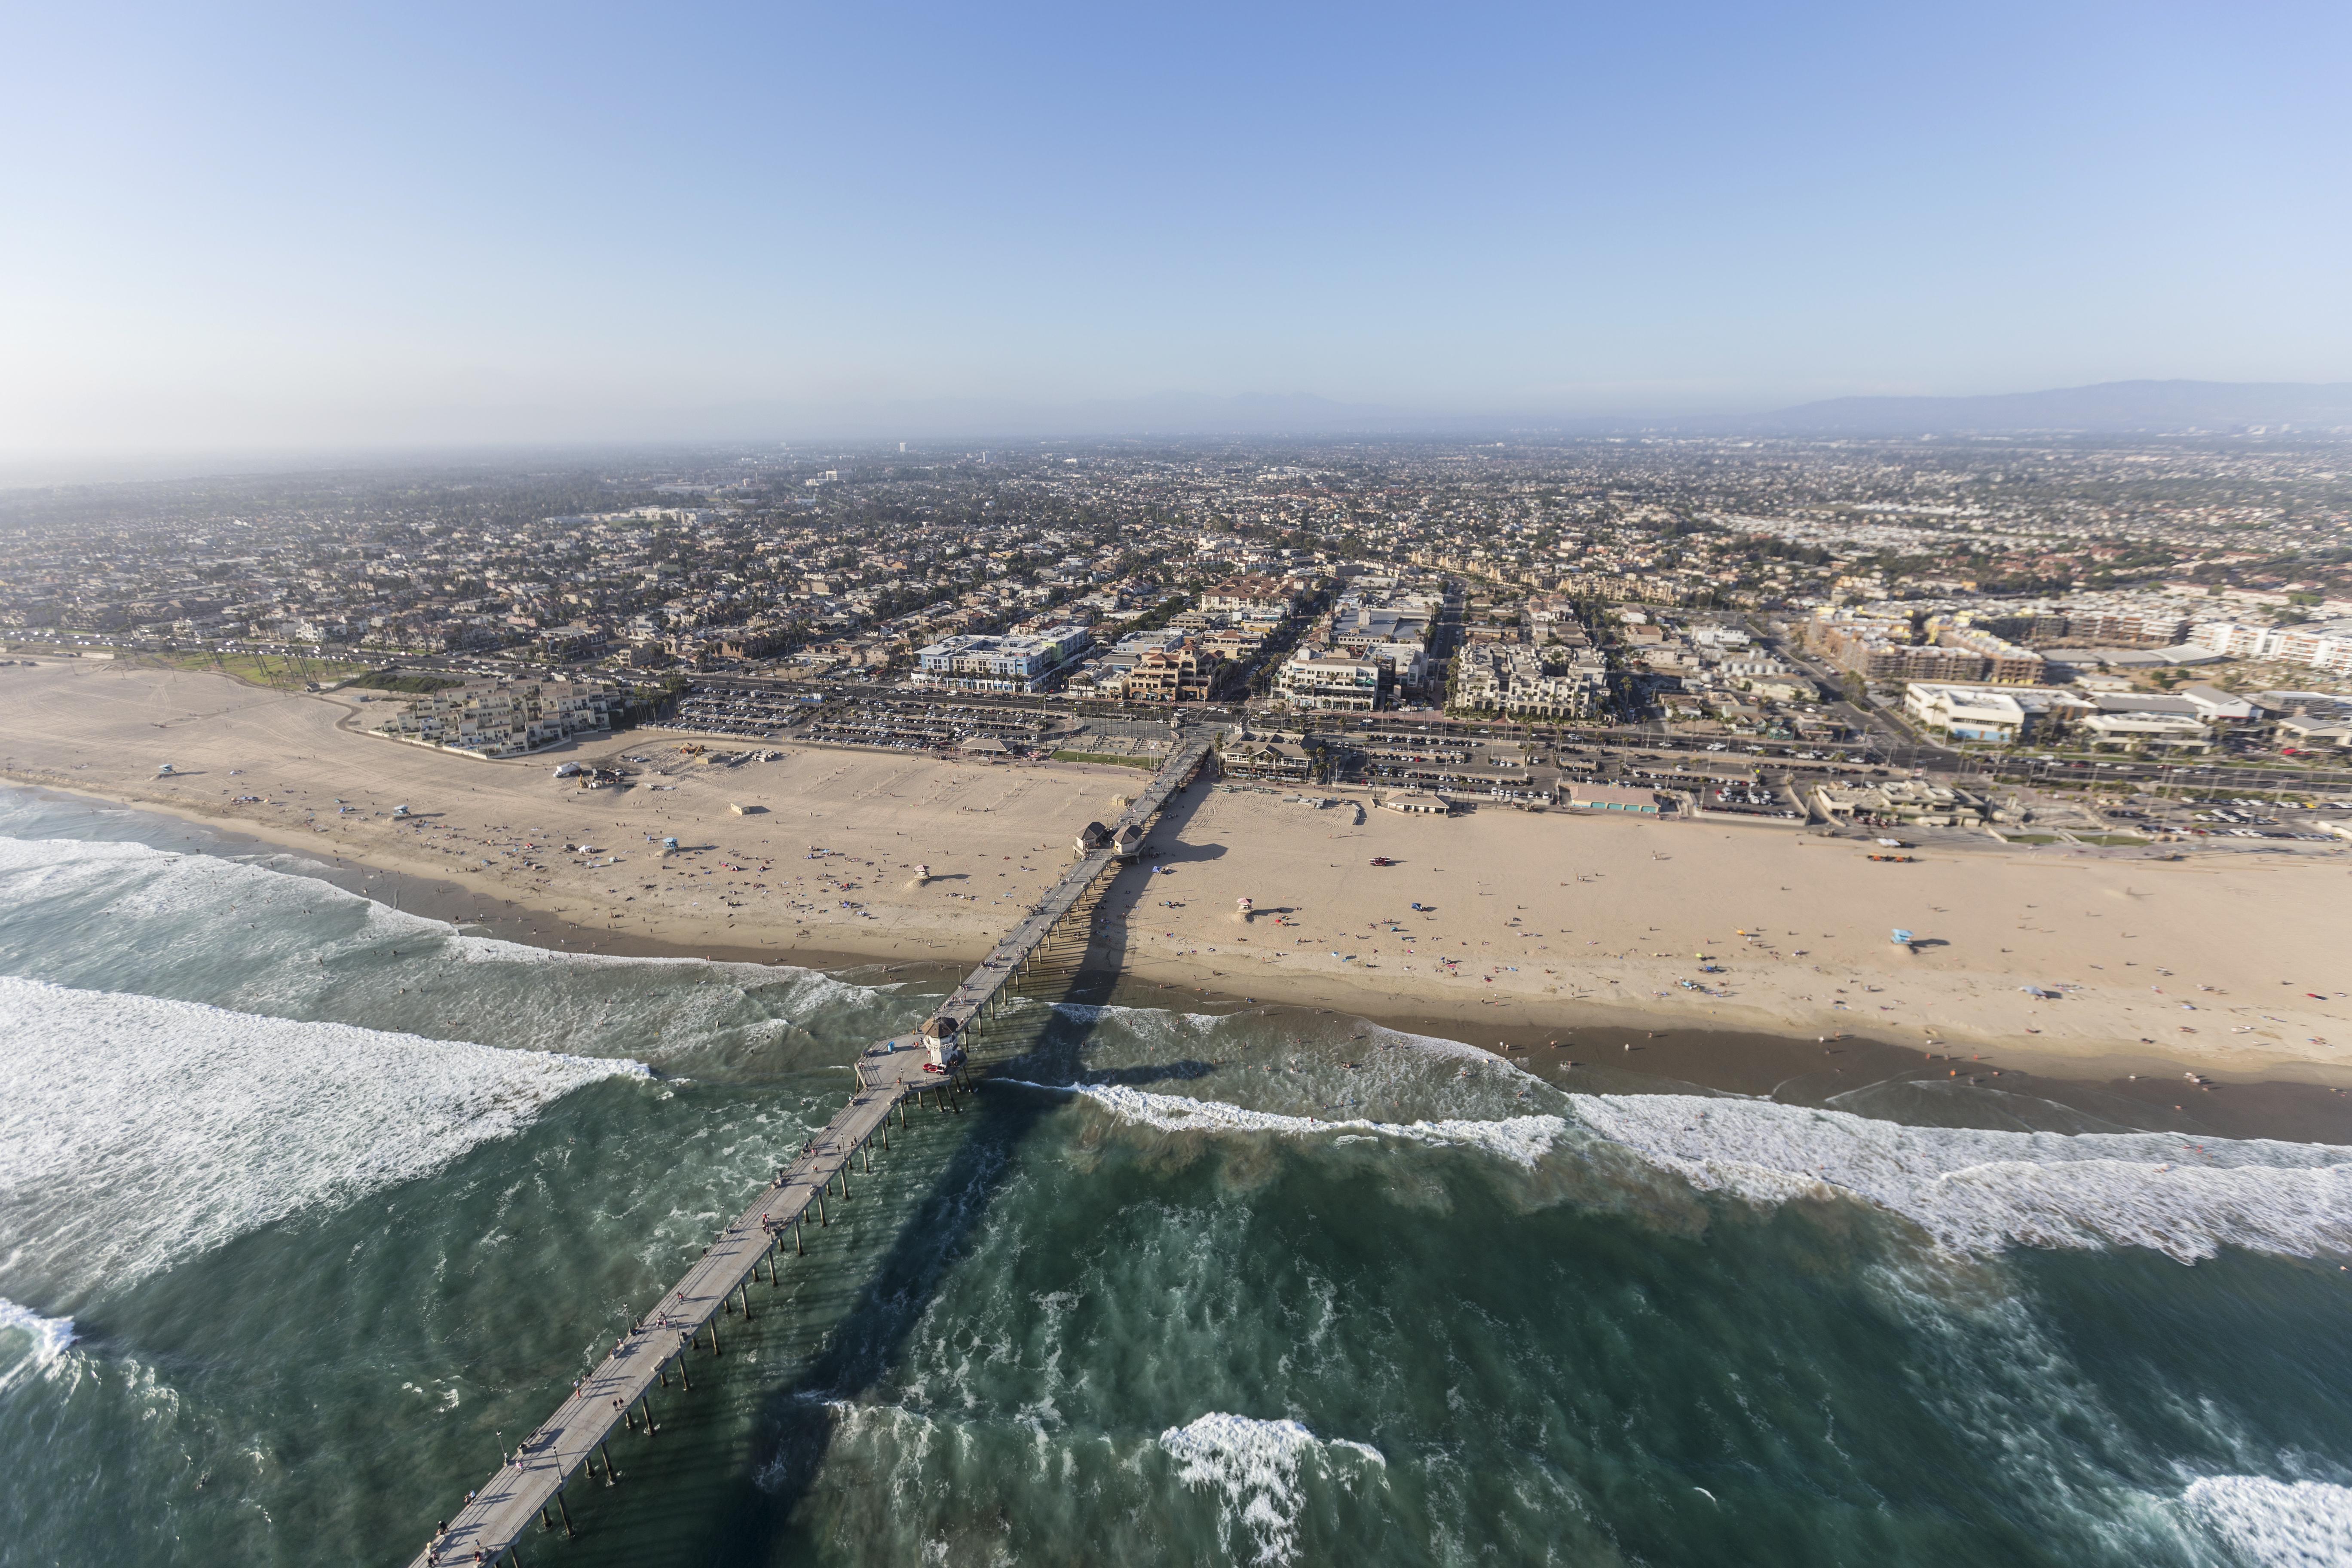 Aerial view of Huntington Beach